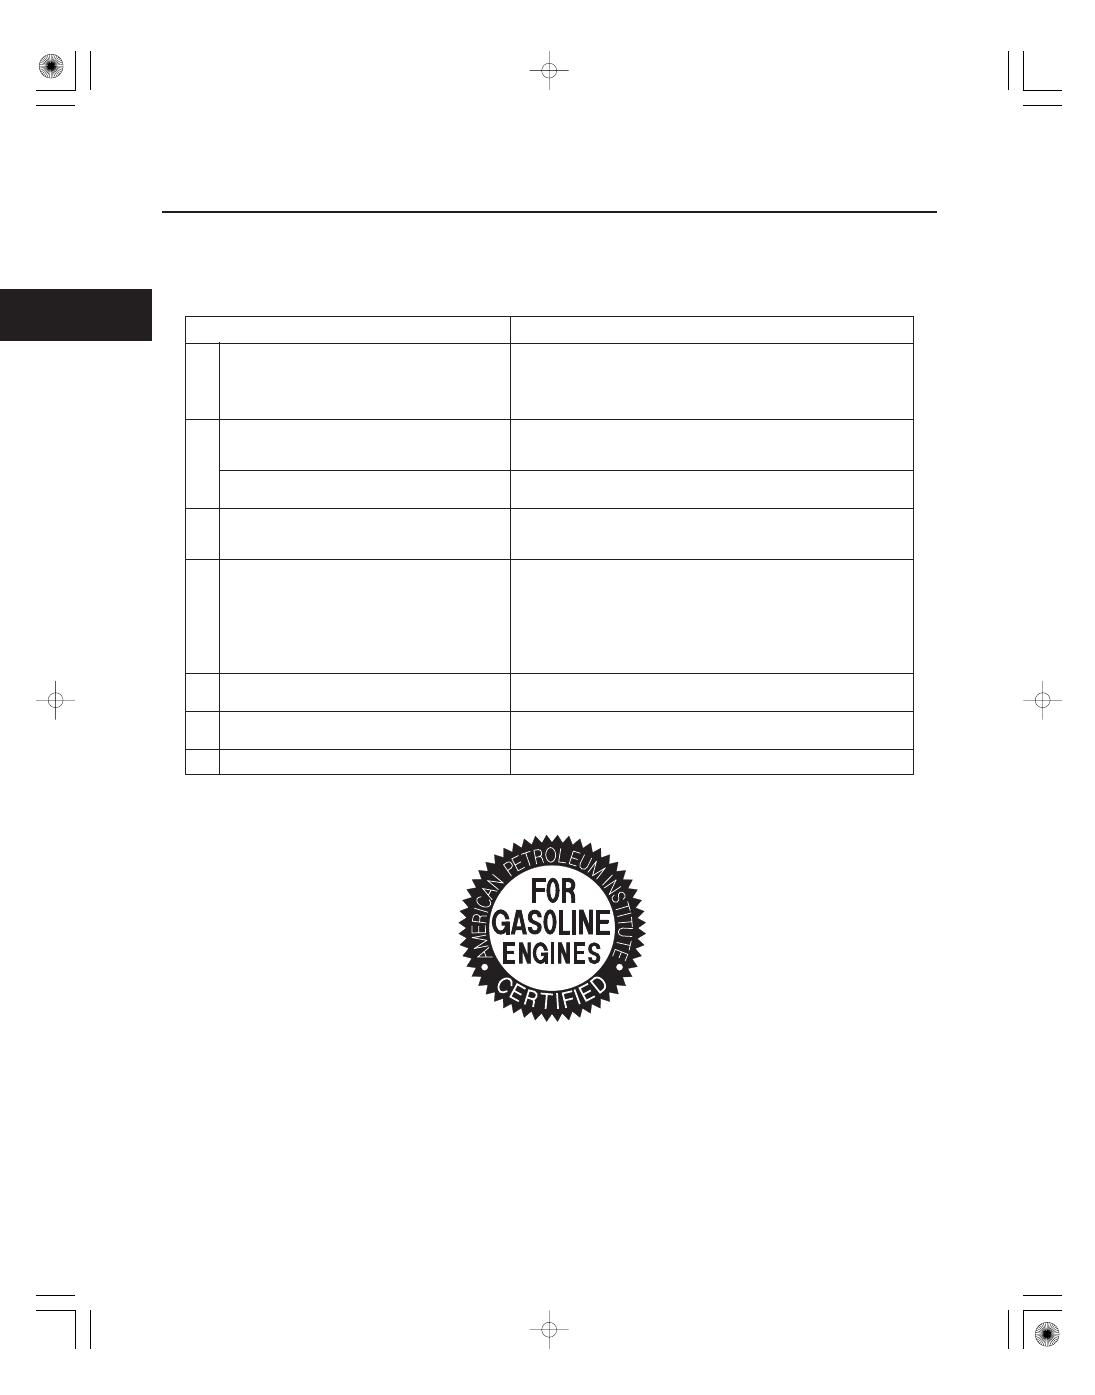 k20z3 overhaul manual various owner manual guide u2022 rh justk co K20Z3 Block K20Z3 Block